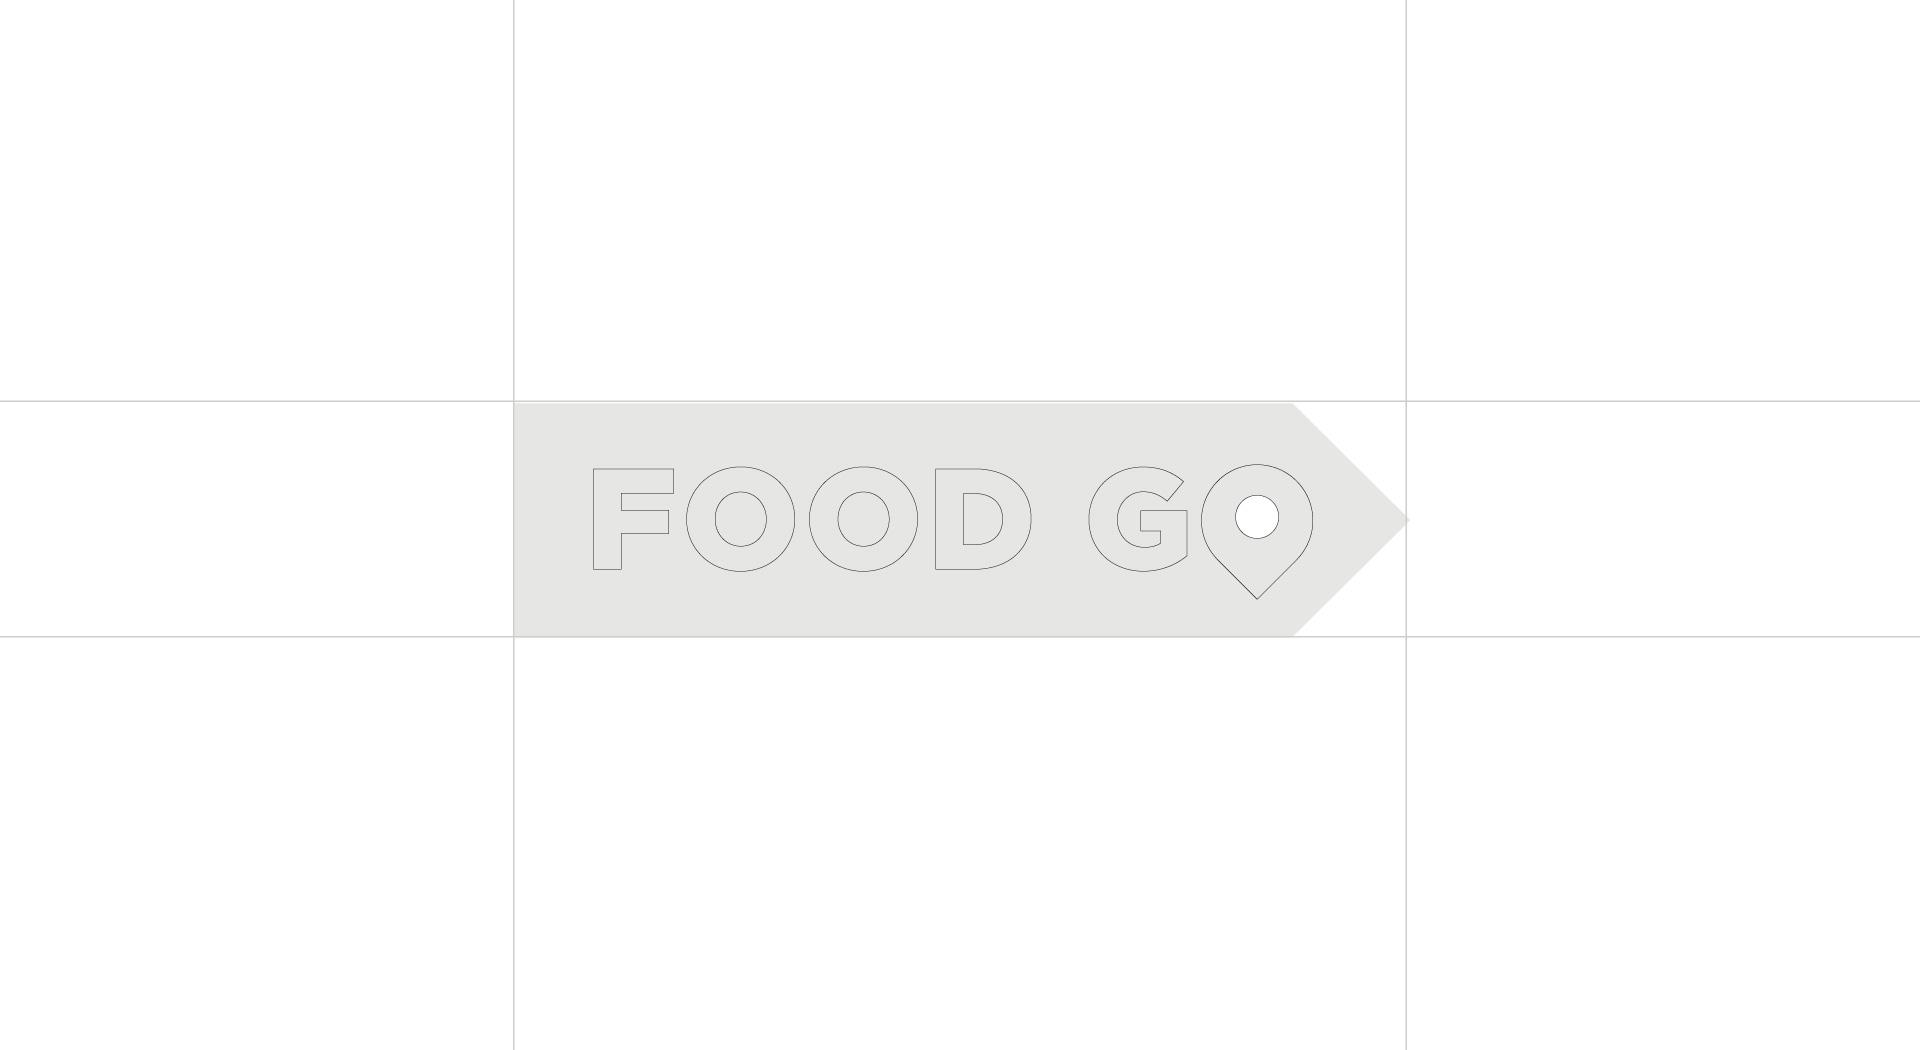 foodgo2.jpg